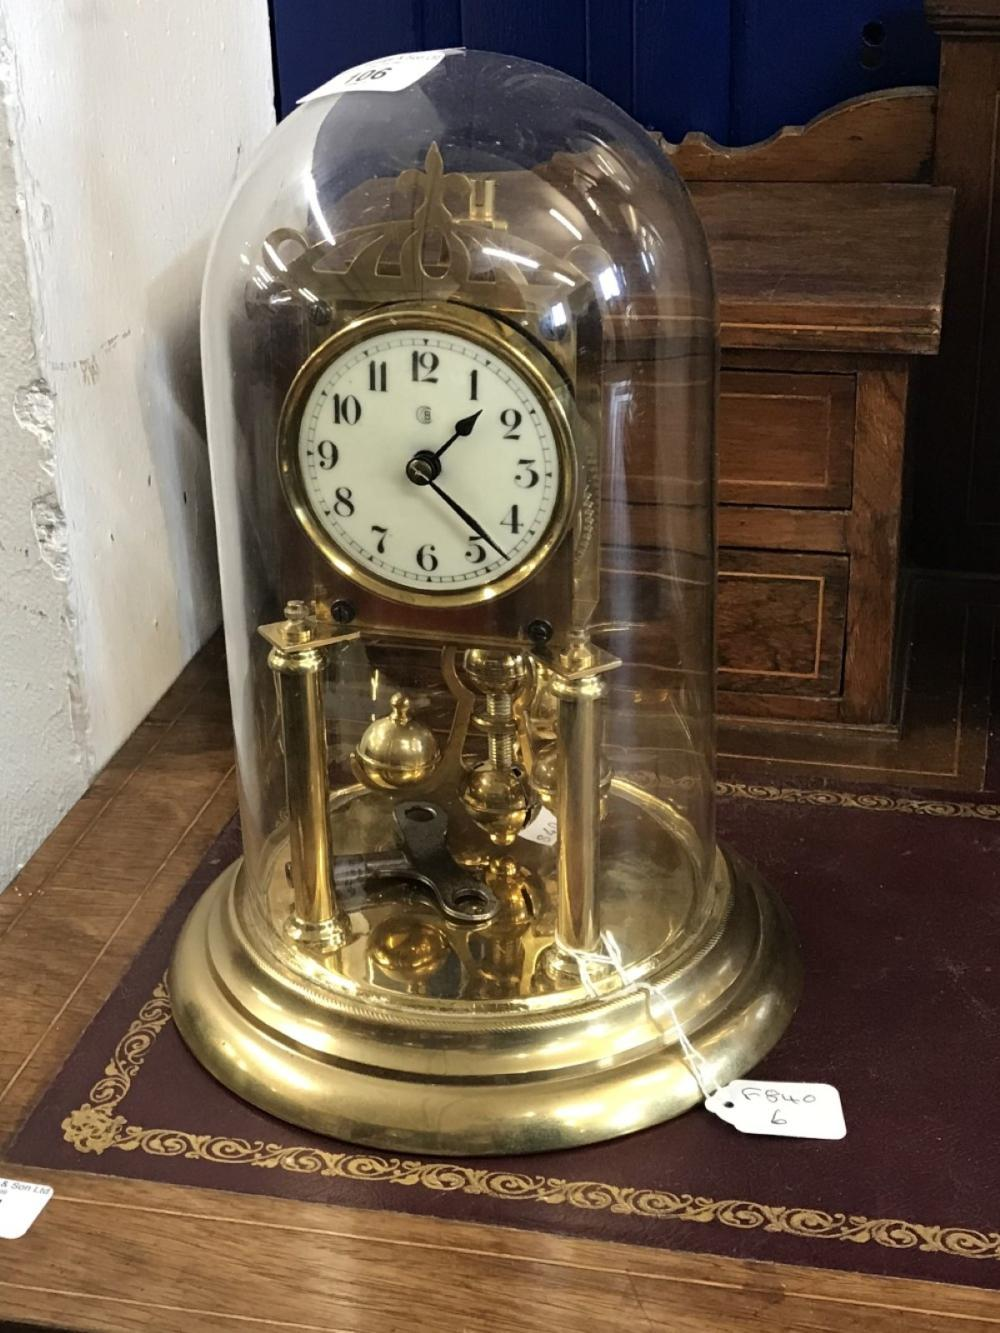 20th cent. Anniversary clock, under glass dome, enamel dial, Arabic numerals. Makers mark Bidische U